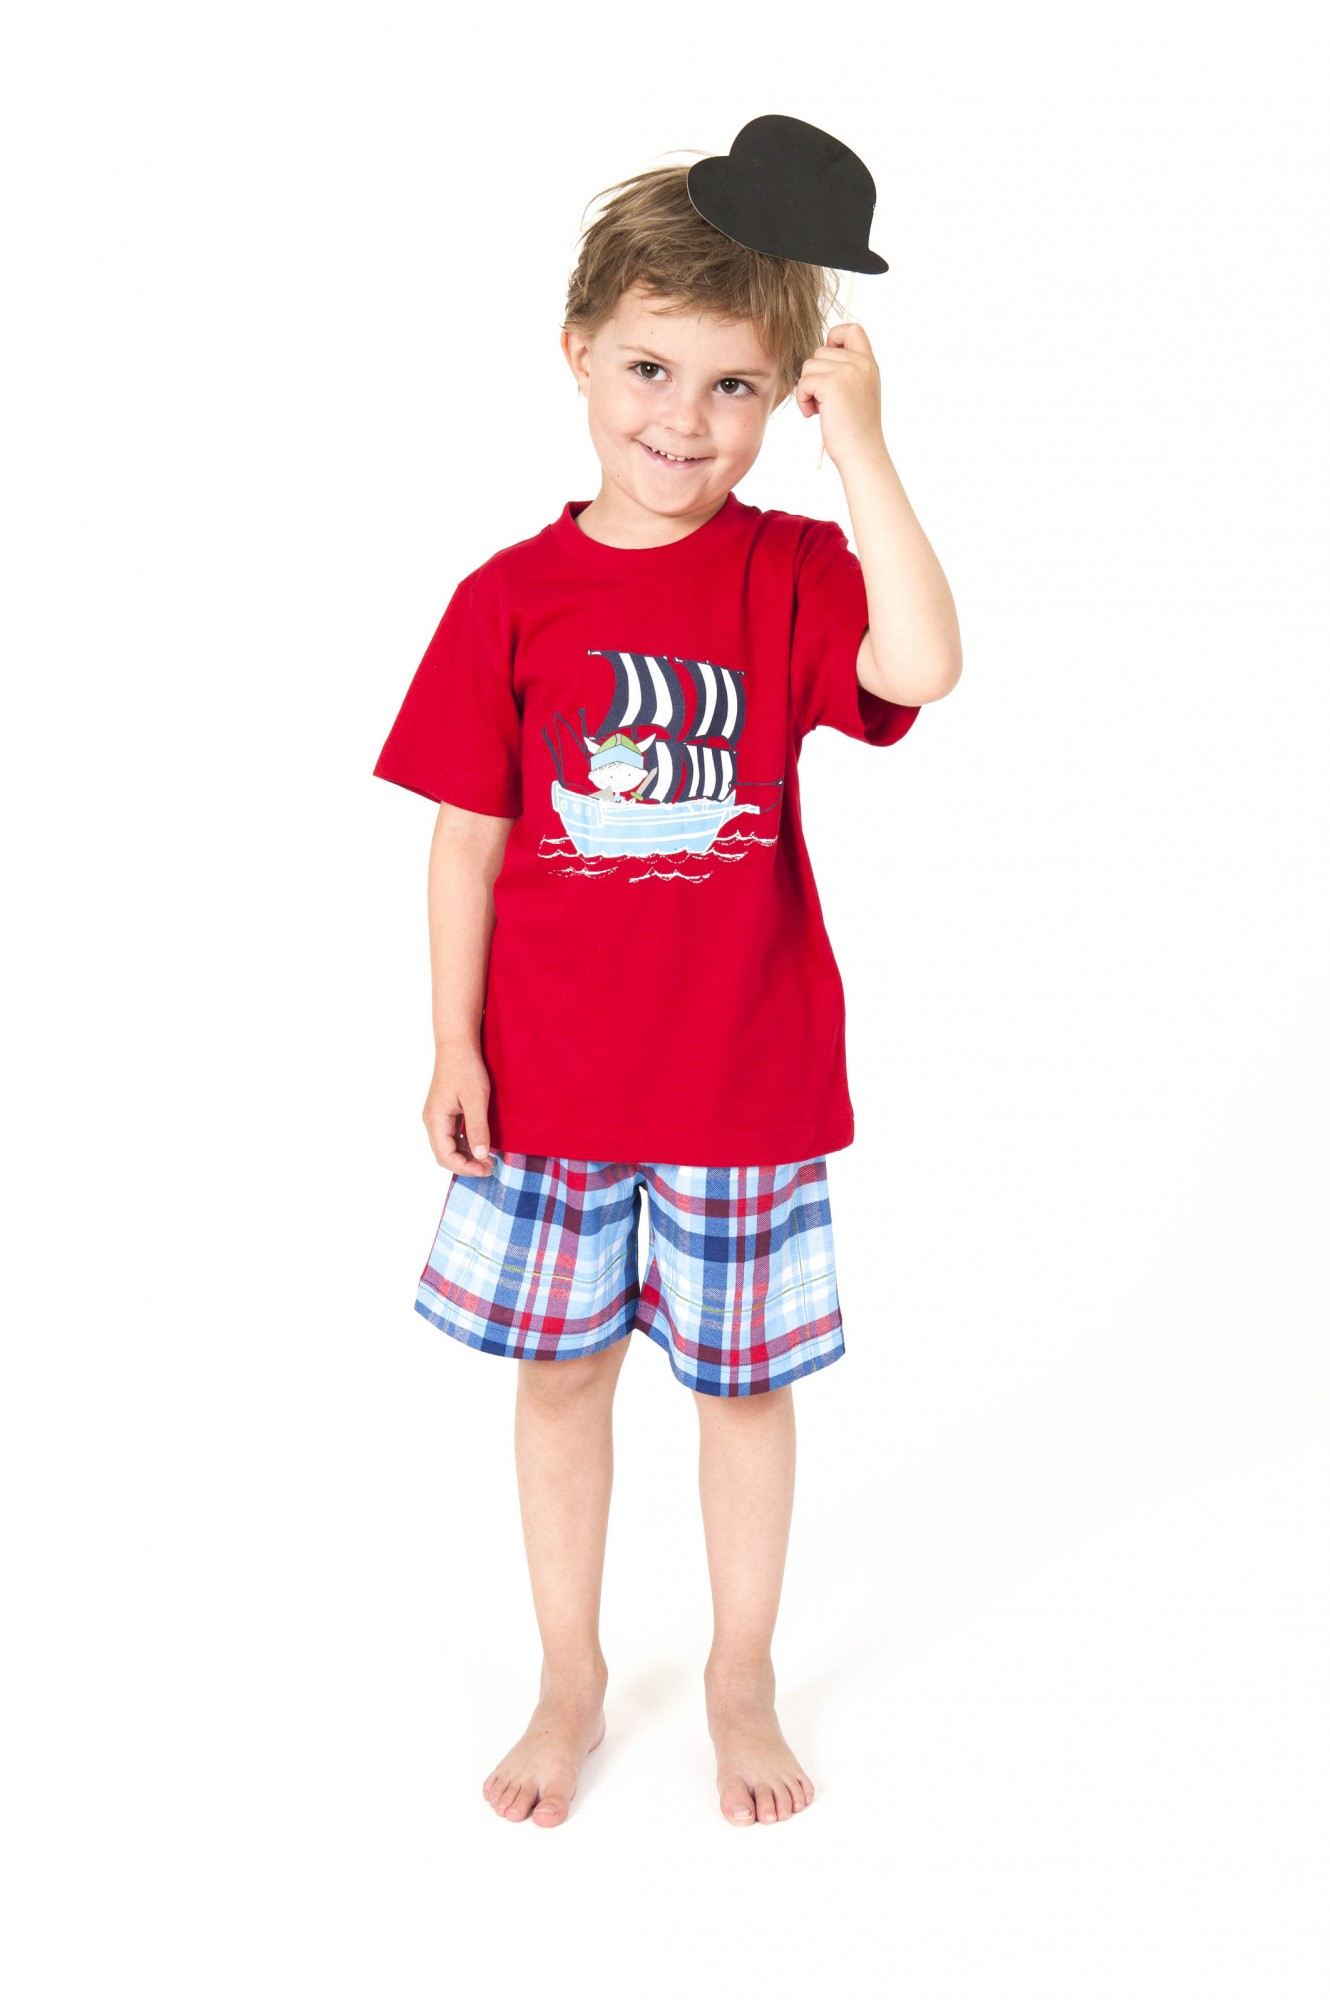 Toller Jungen Pyjama Shorty kurzarm – 161 805 90 500 001